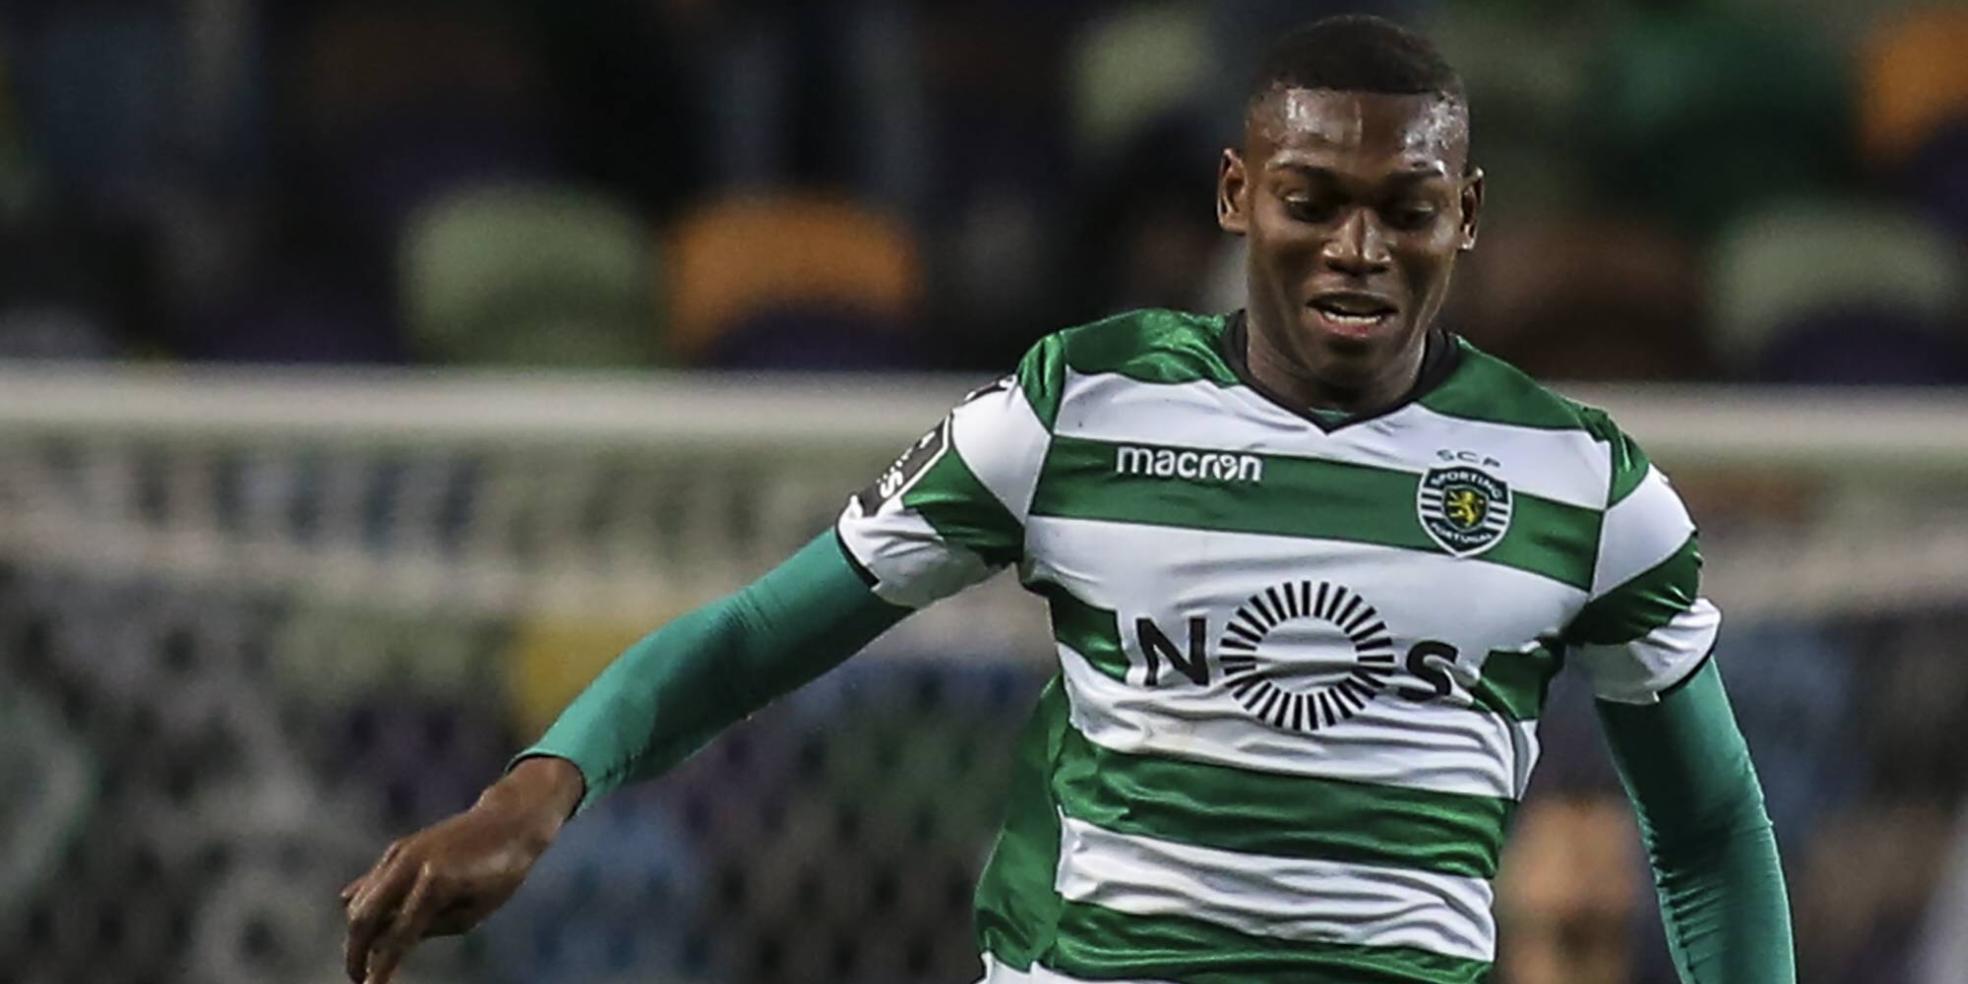 Rafael Leao von Sporting Lissabon